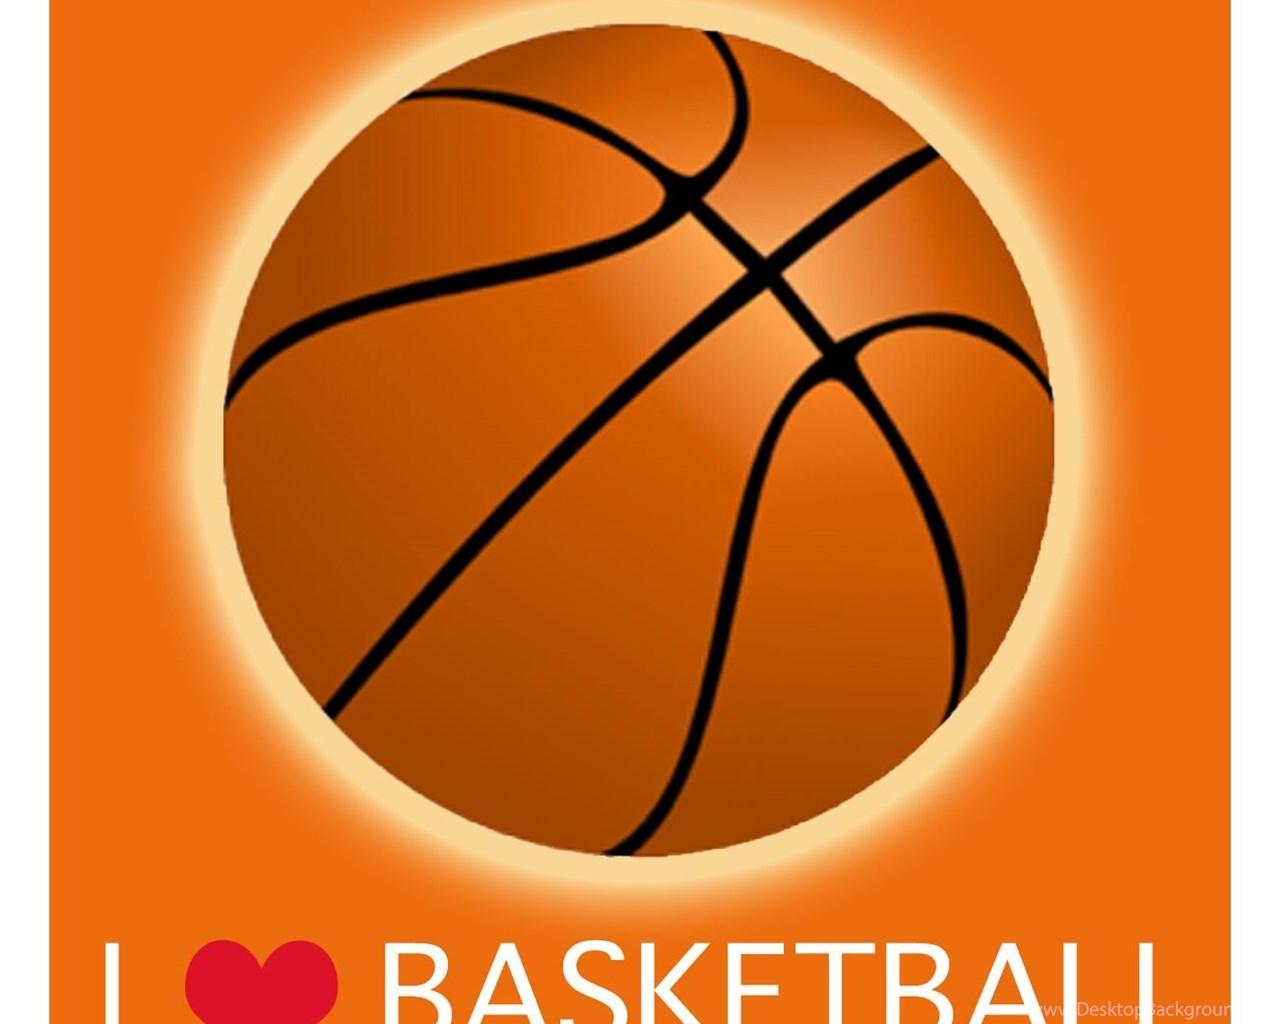 Laila S Kde032 5e I Love Basketball Canvas Art Desktop Background